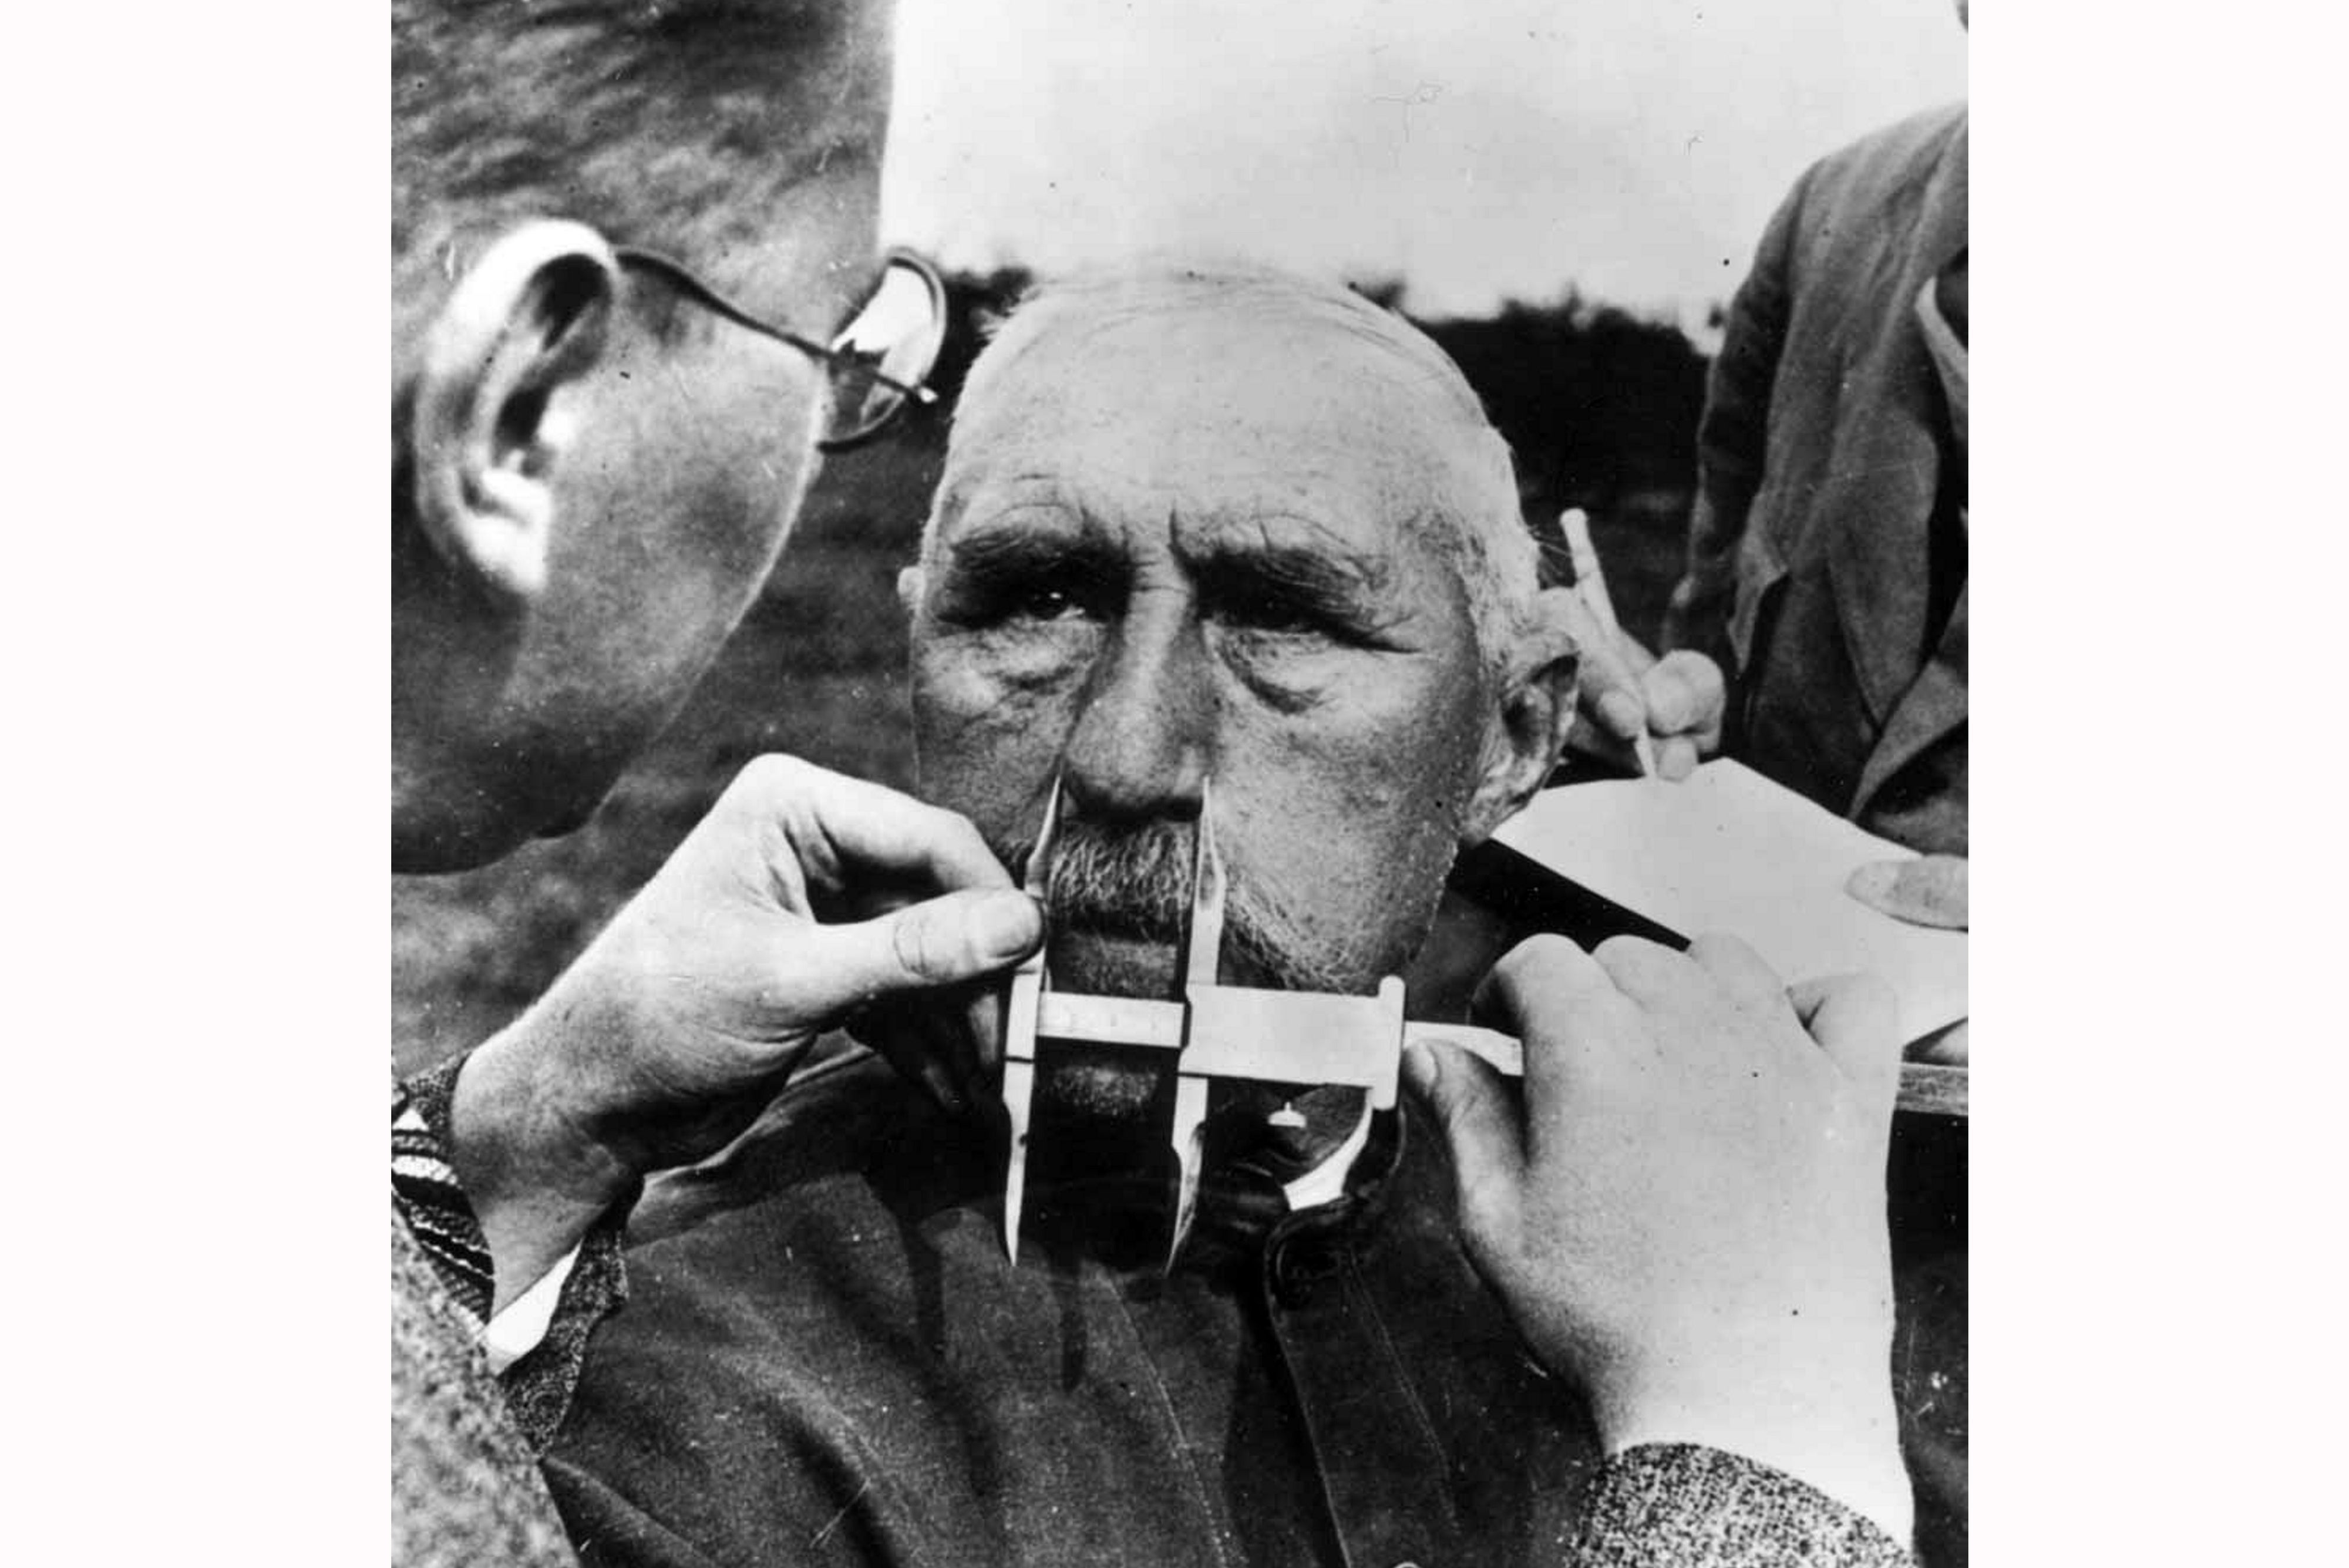 Neurologists' Role in Nazi